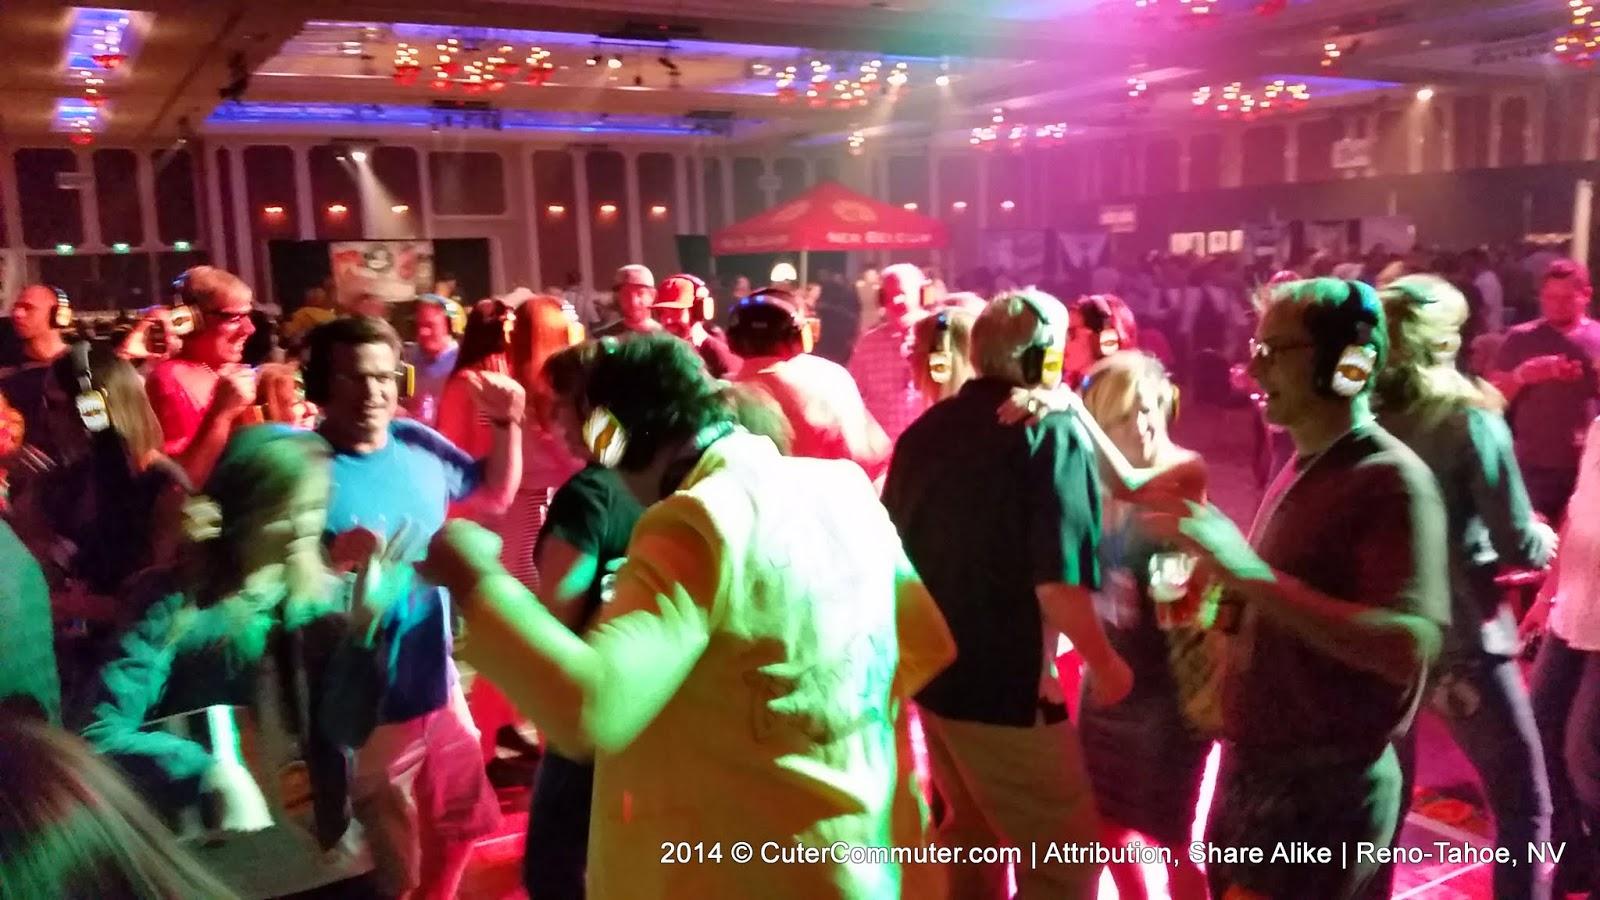 People dancing to music through headphones on the silent disco floor.